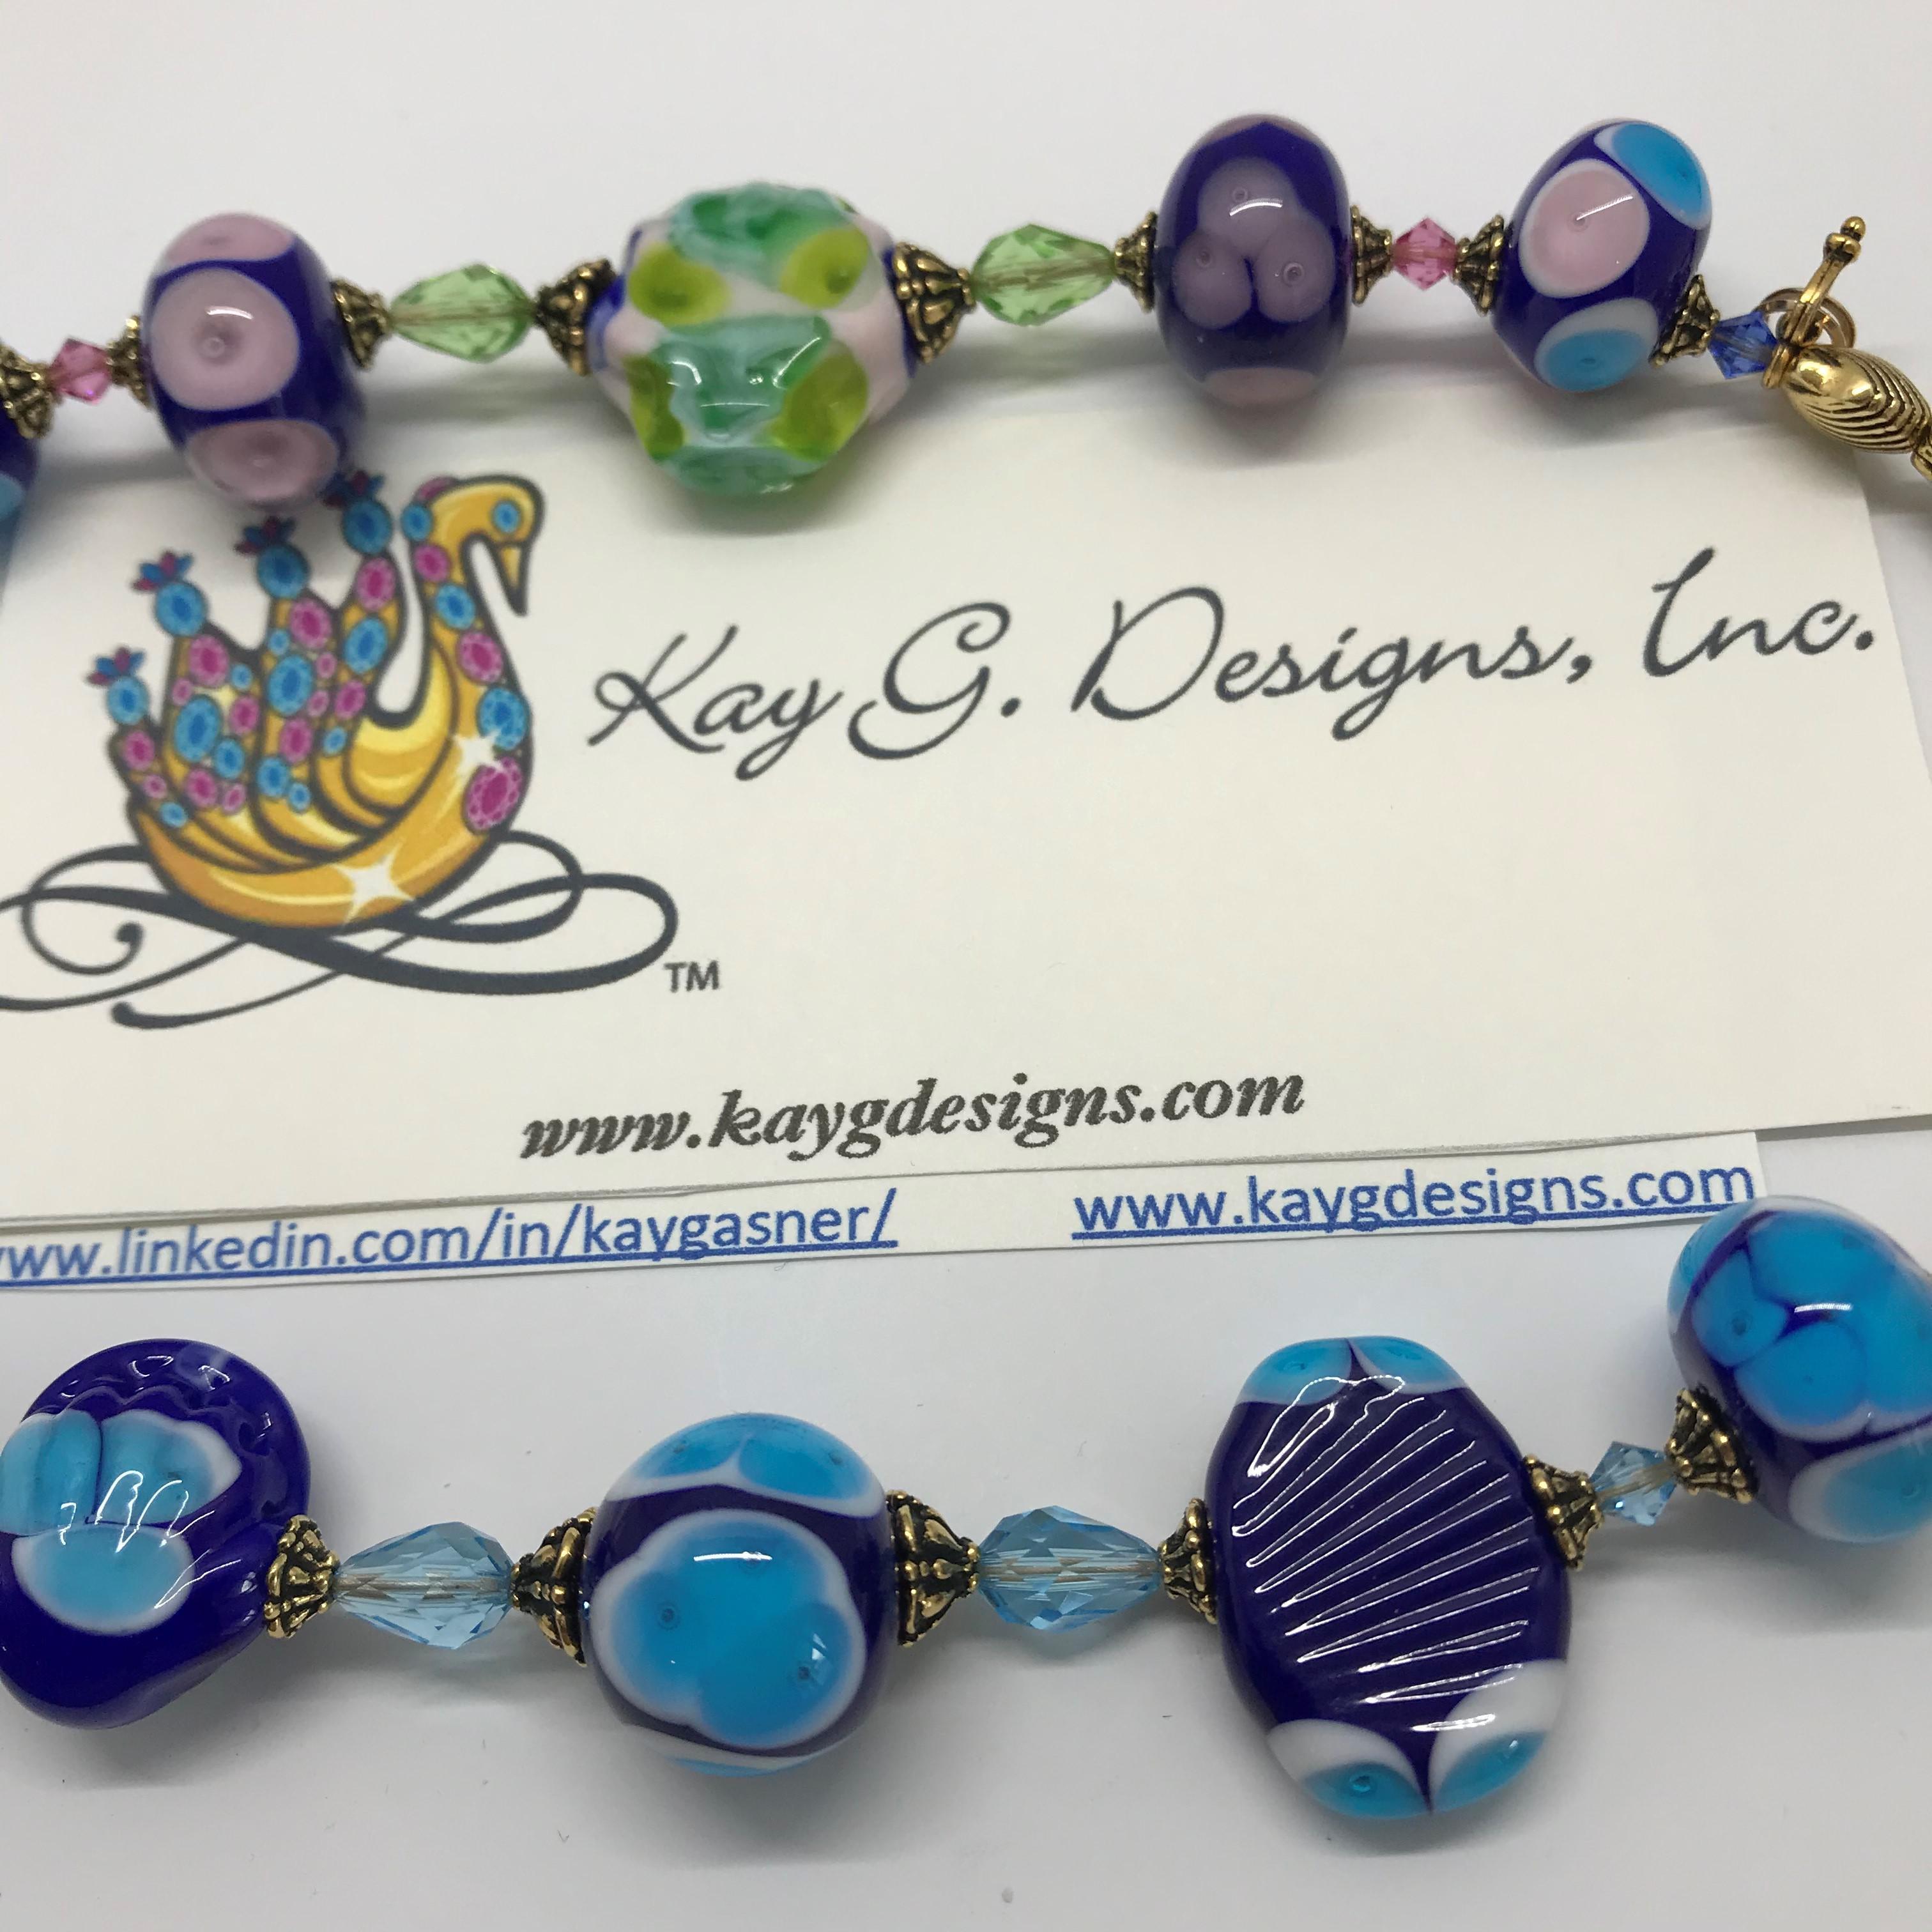 Kay G Designs Inc